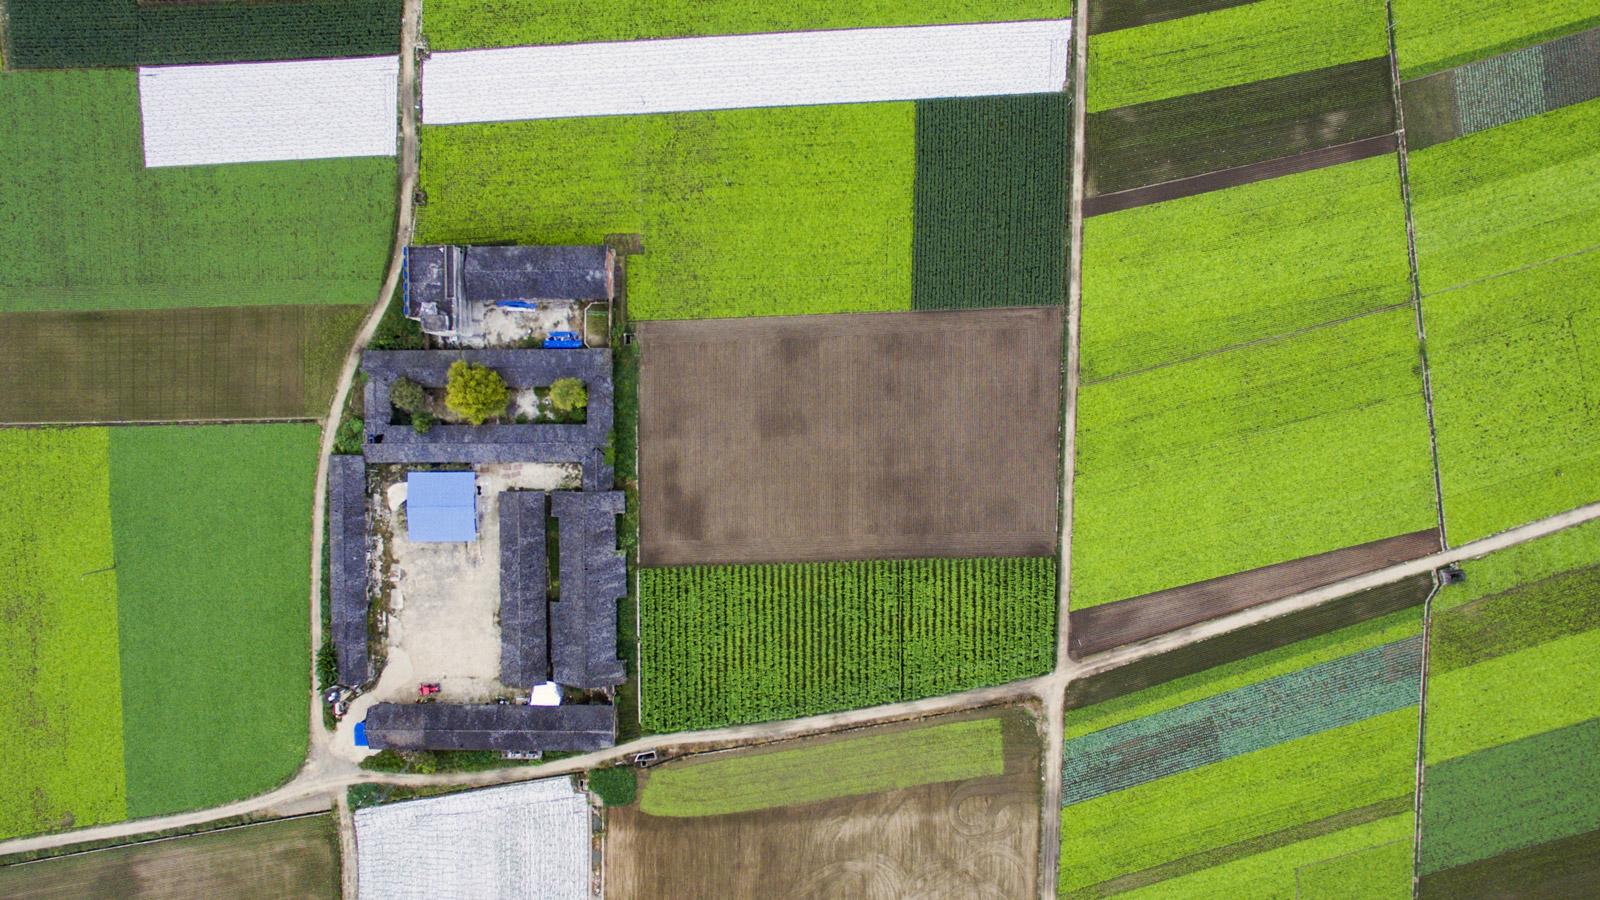 Image: Rural farmland in desperate need of reconsideration.